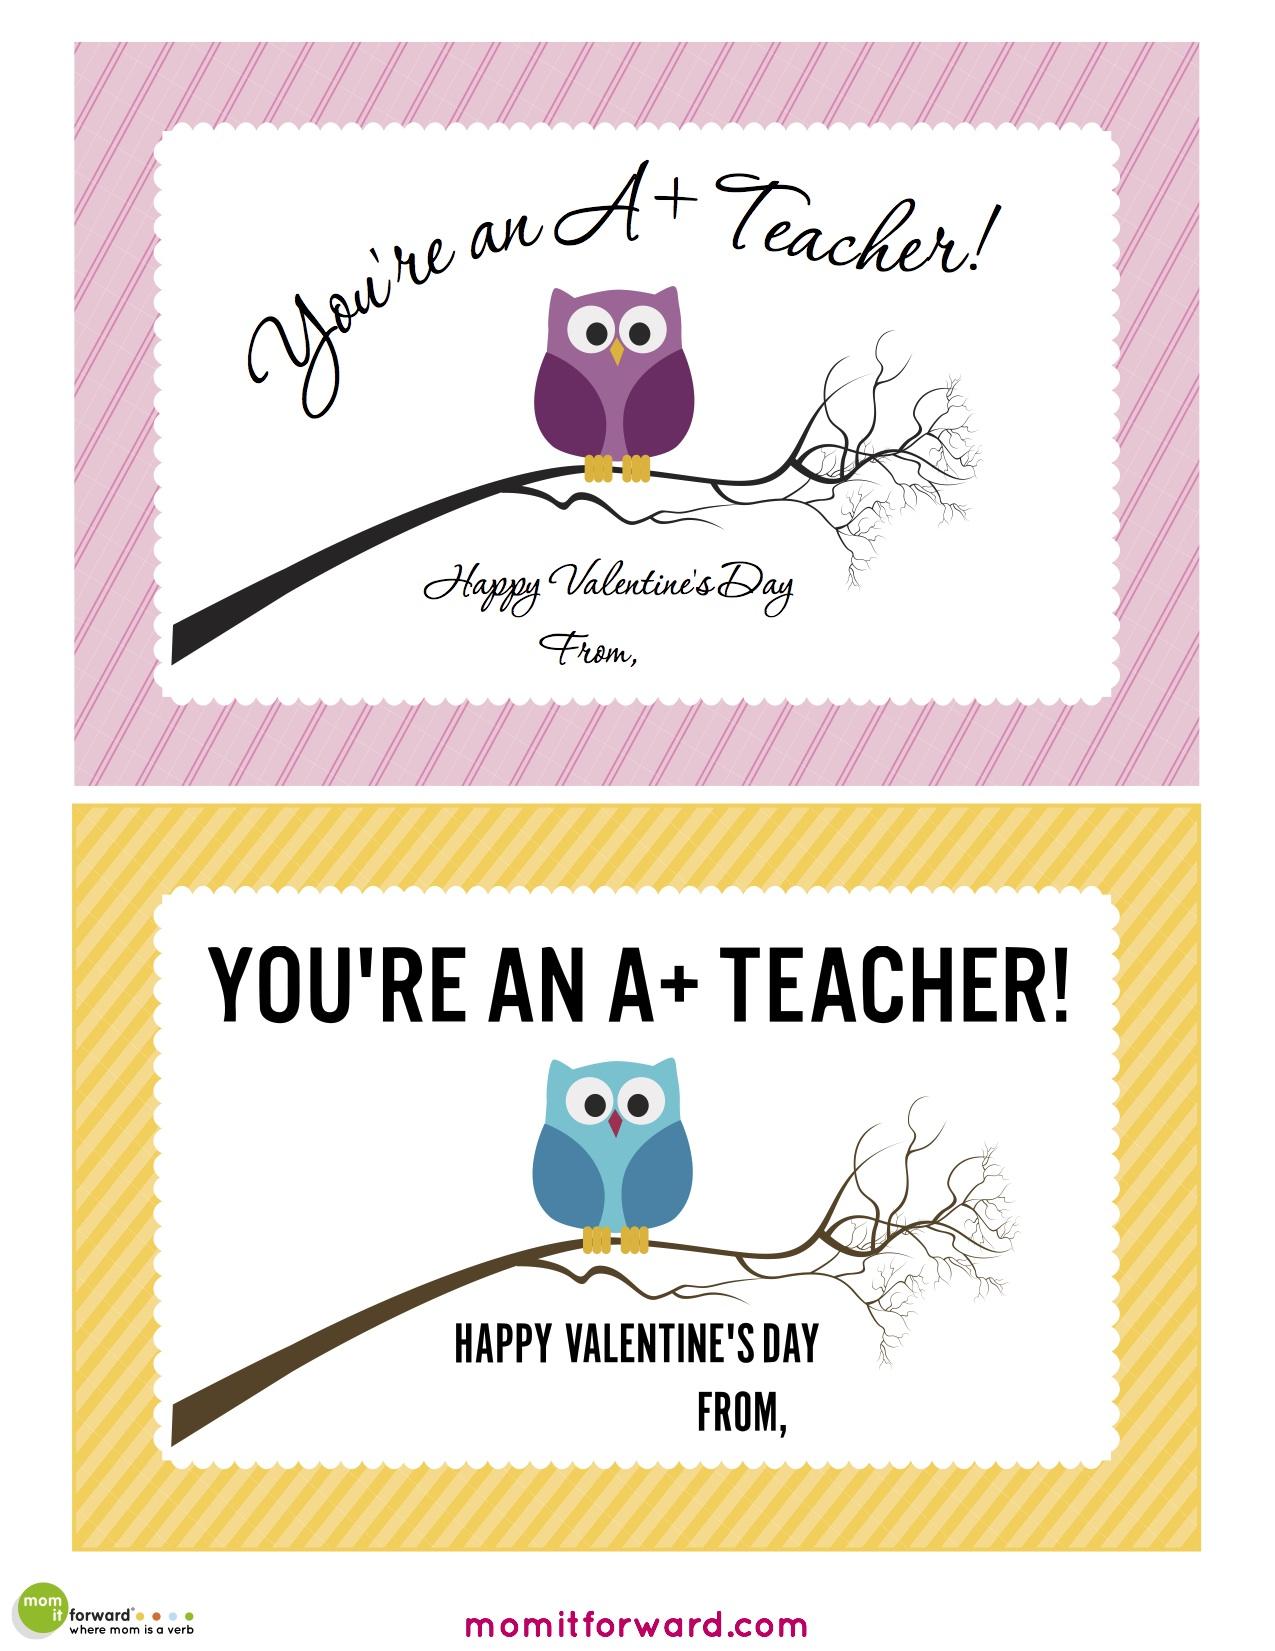 Valentine Card Messages For A Teacher Valentine Day – Valentine Cards with Messages